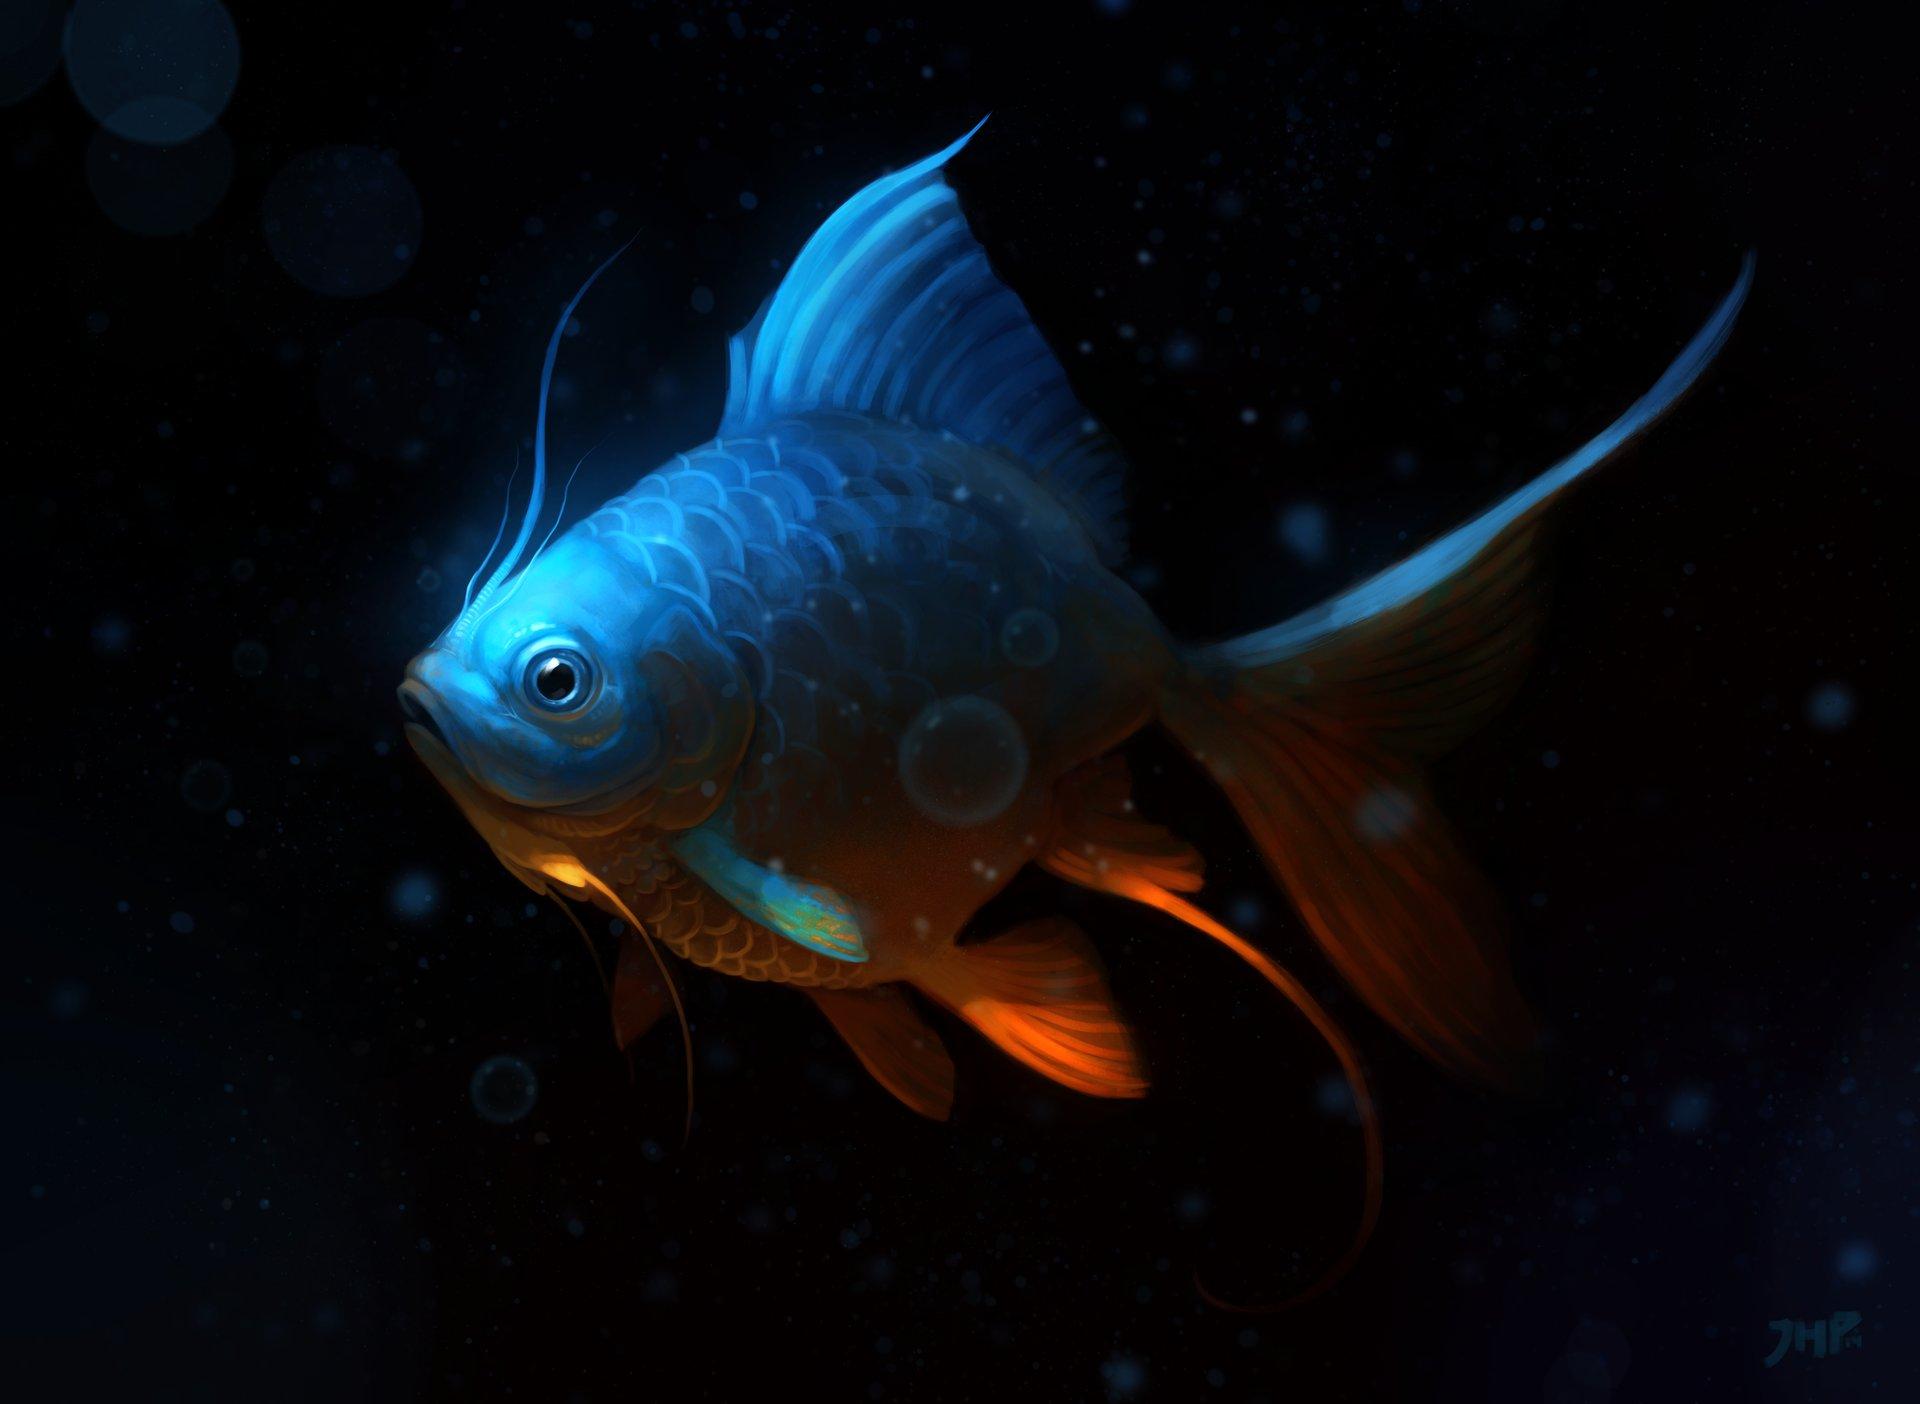 Joao henrique pacheco peixe 2